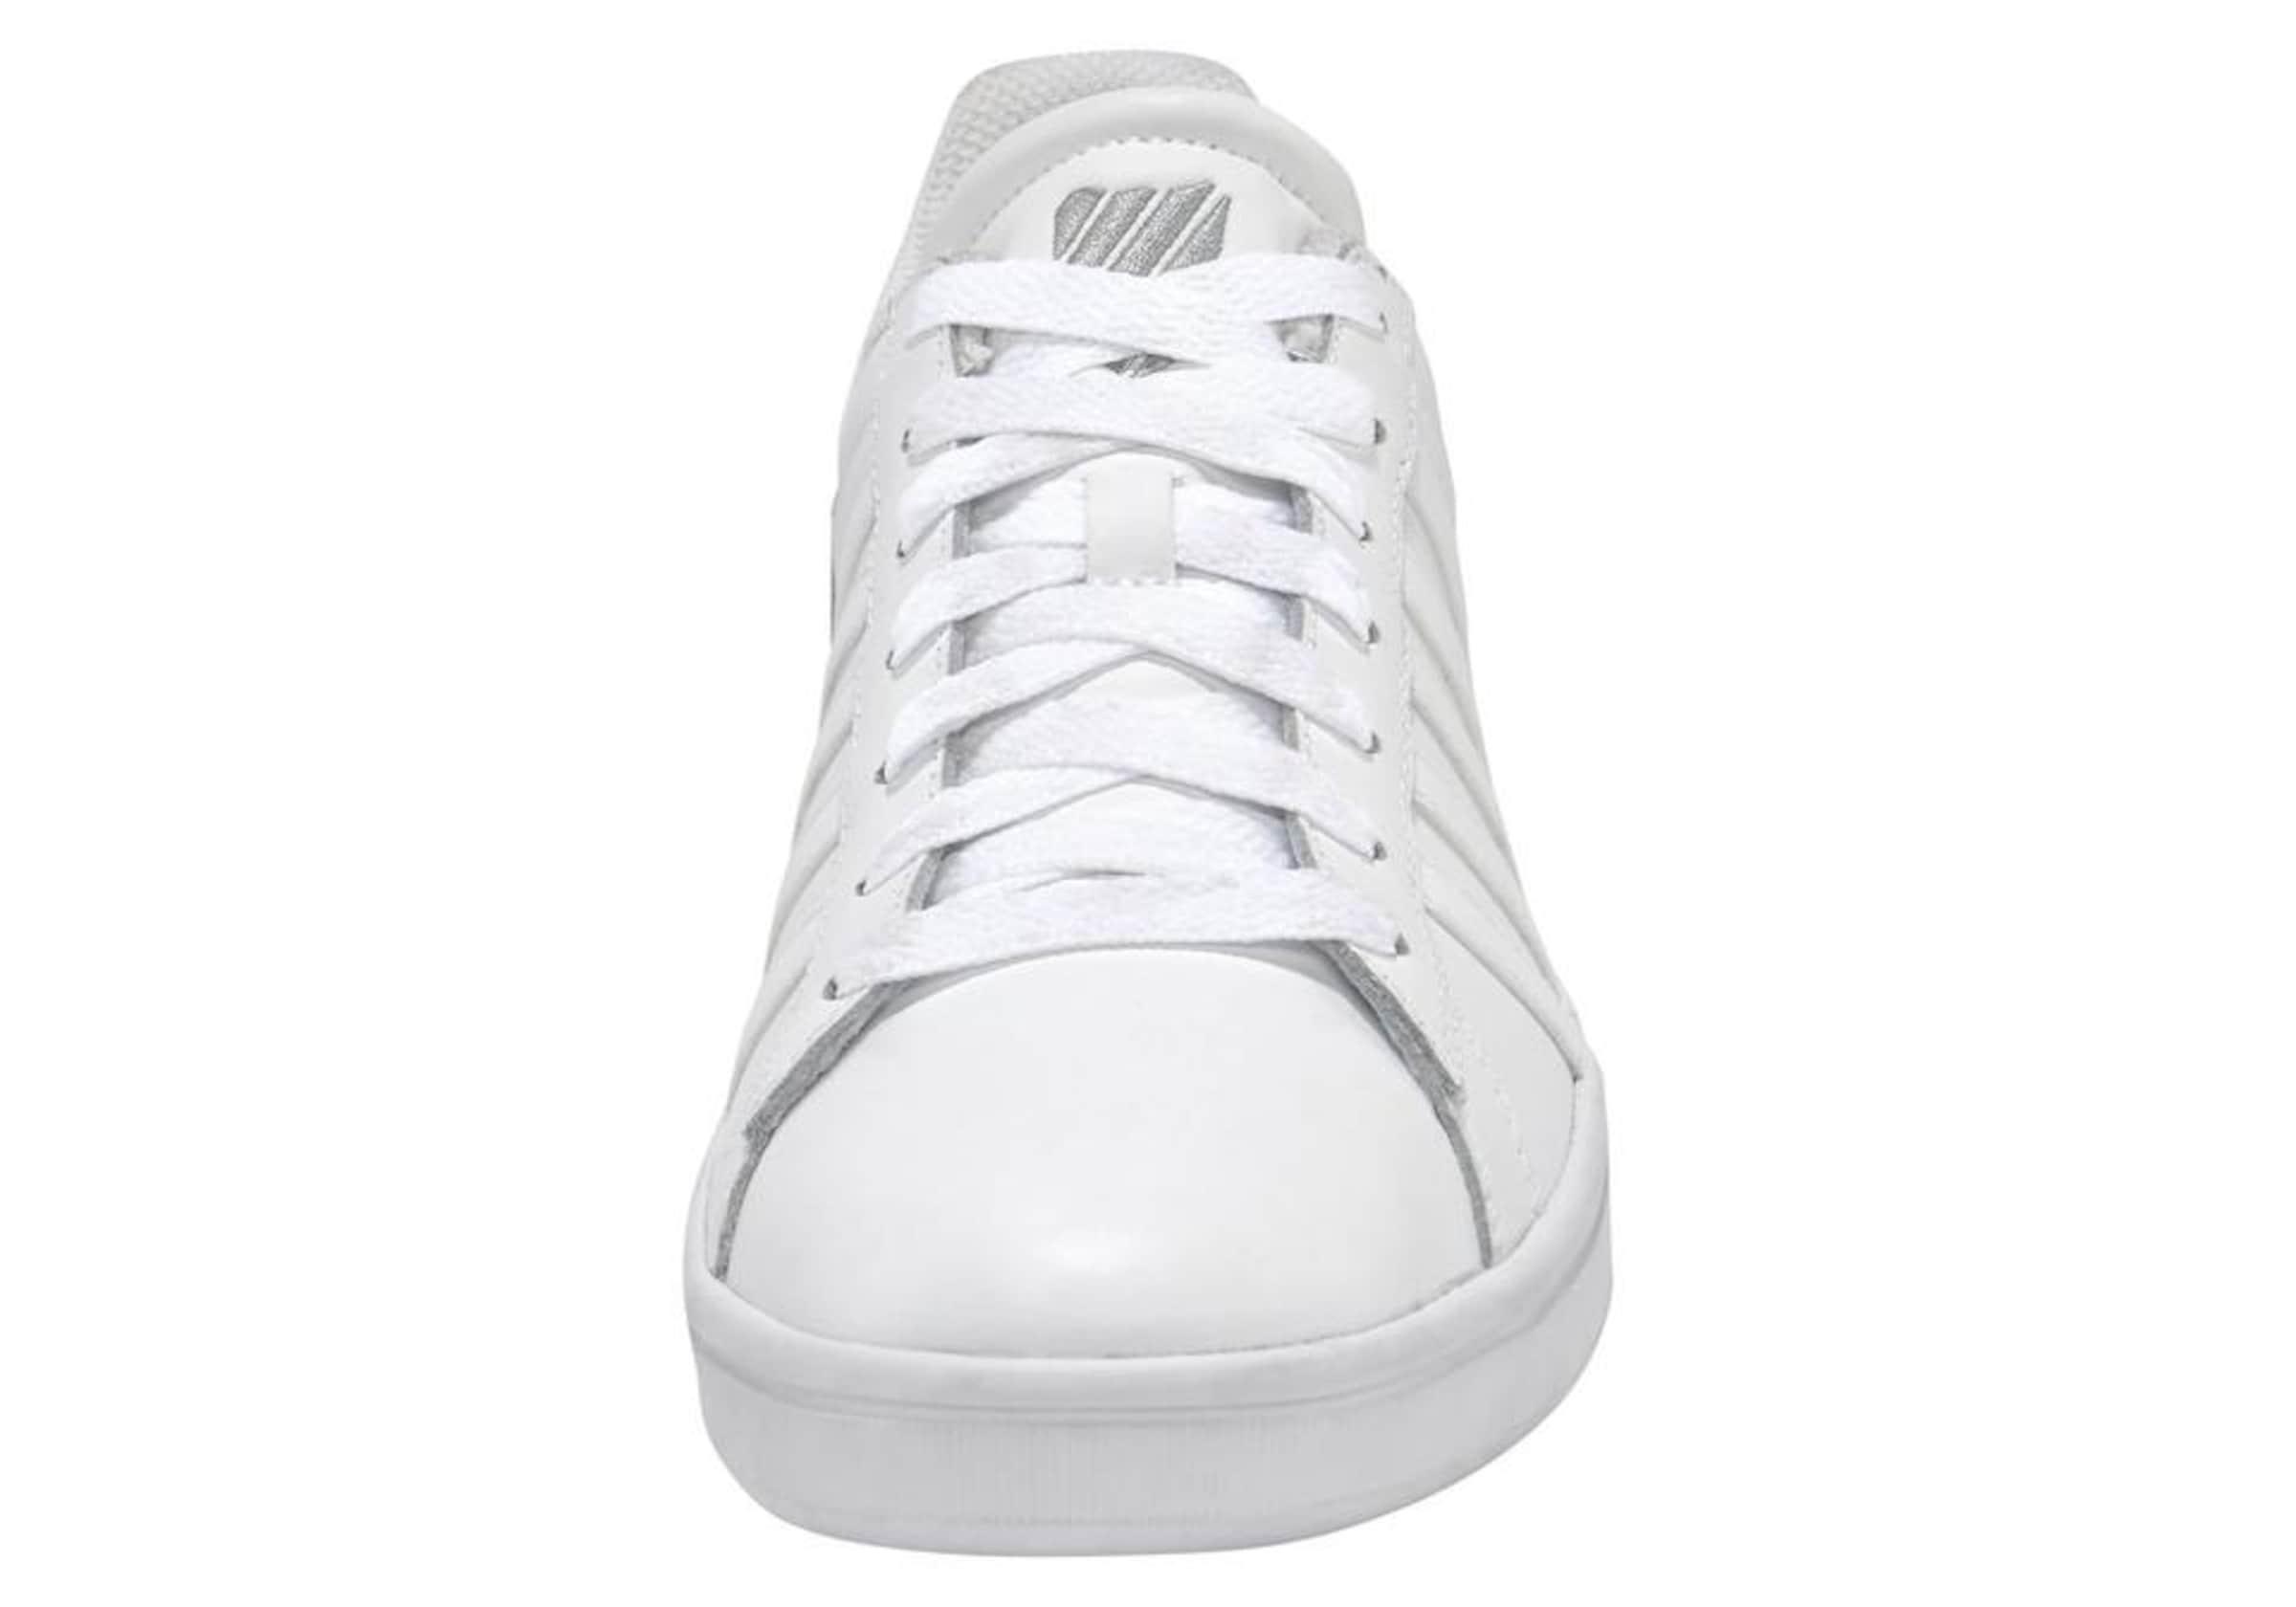 Wh9ed2iy Winston Sneaker 6ygb7yf Weiß K 'court Swiss In M' wPX8Onk0